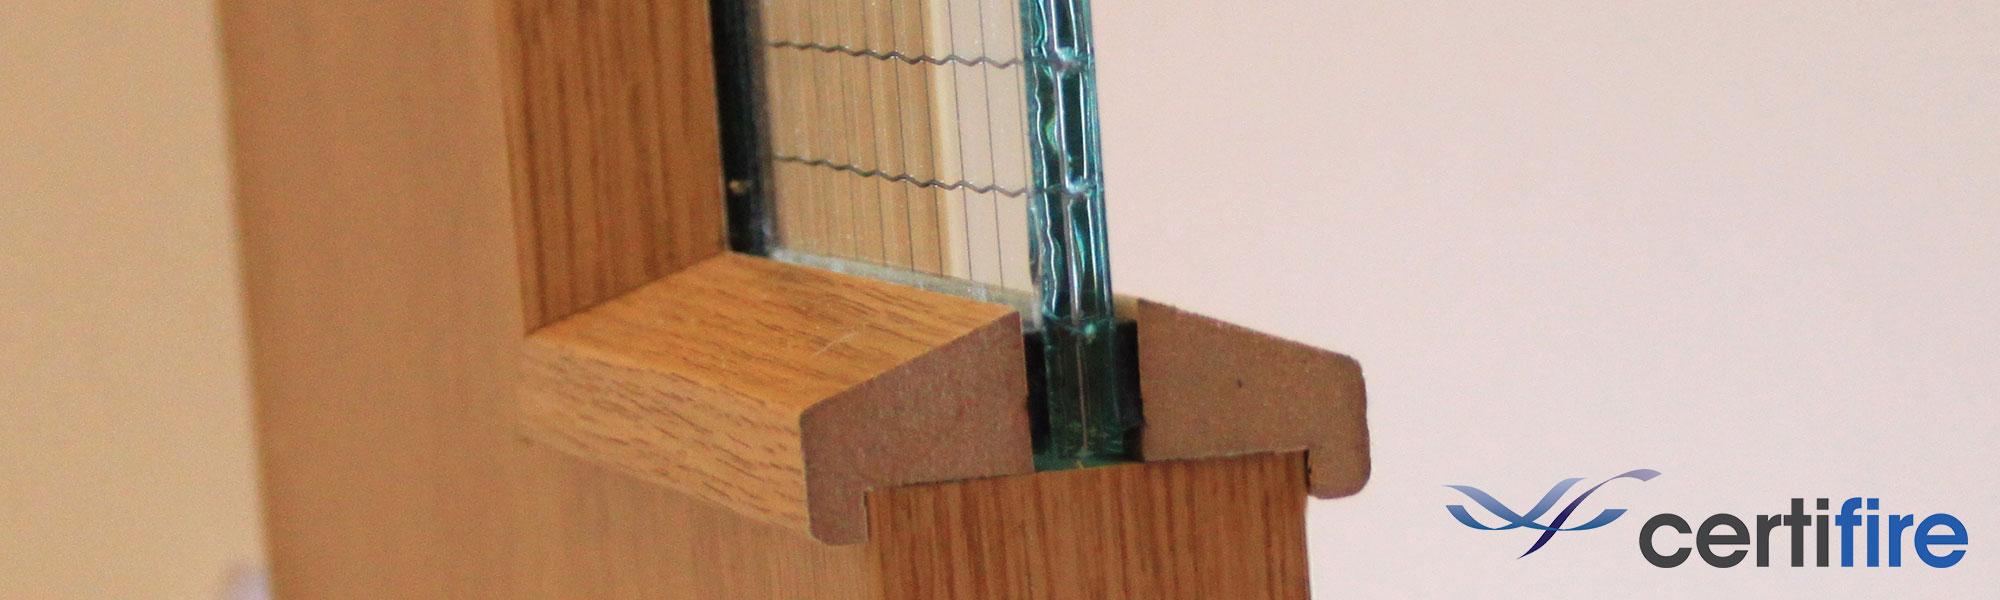 Morland QuickFix™ FD30 Glazing Bead